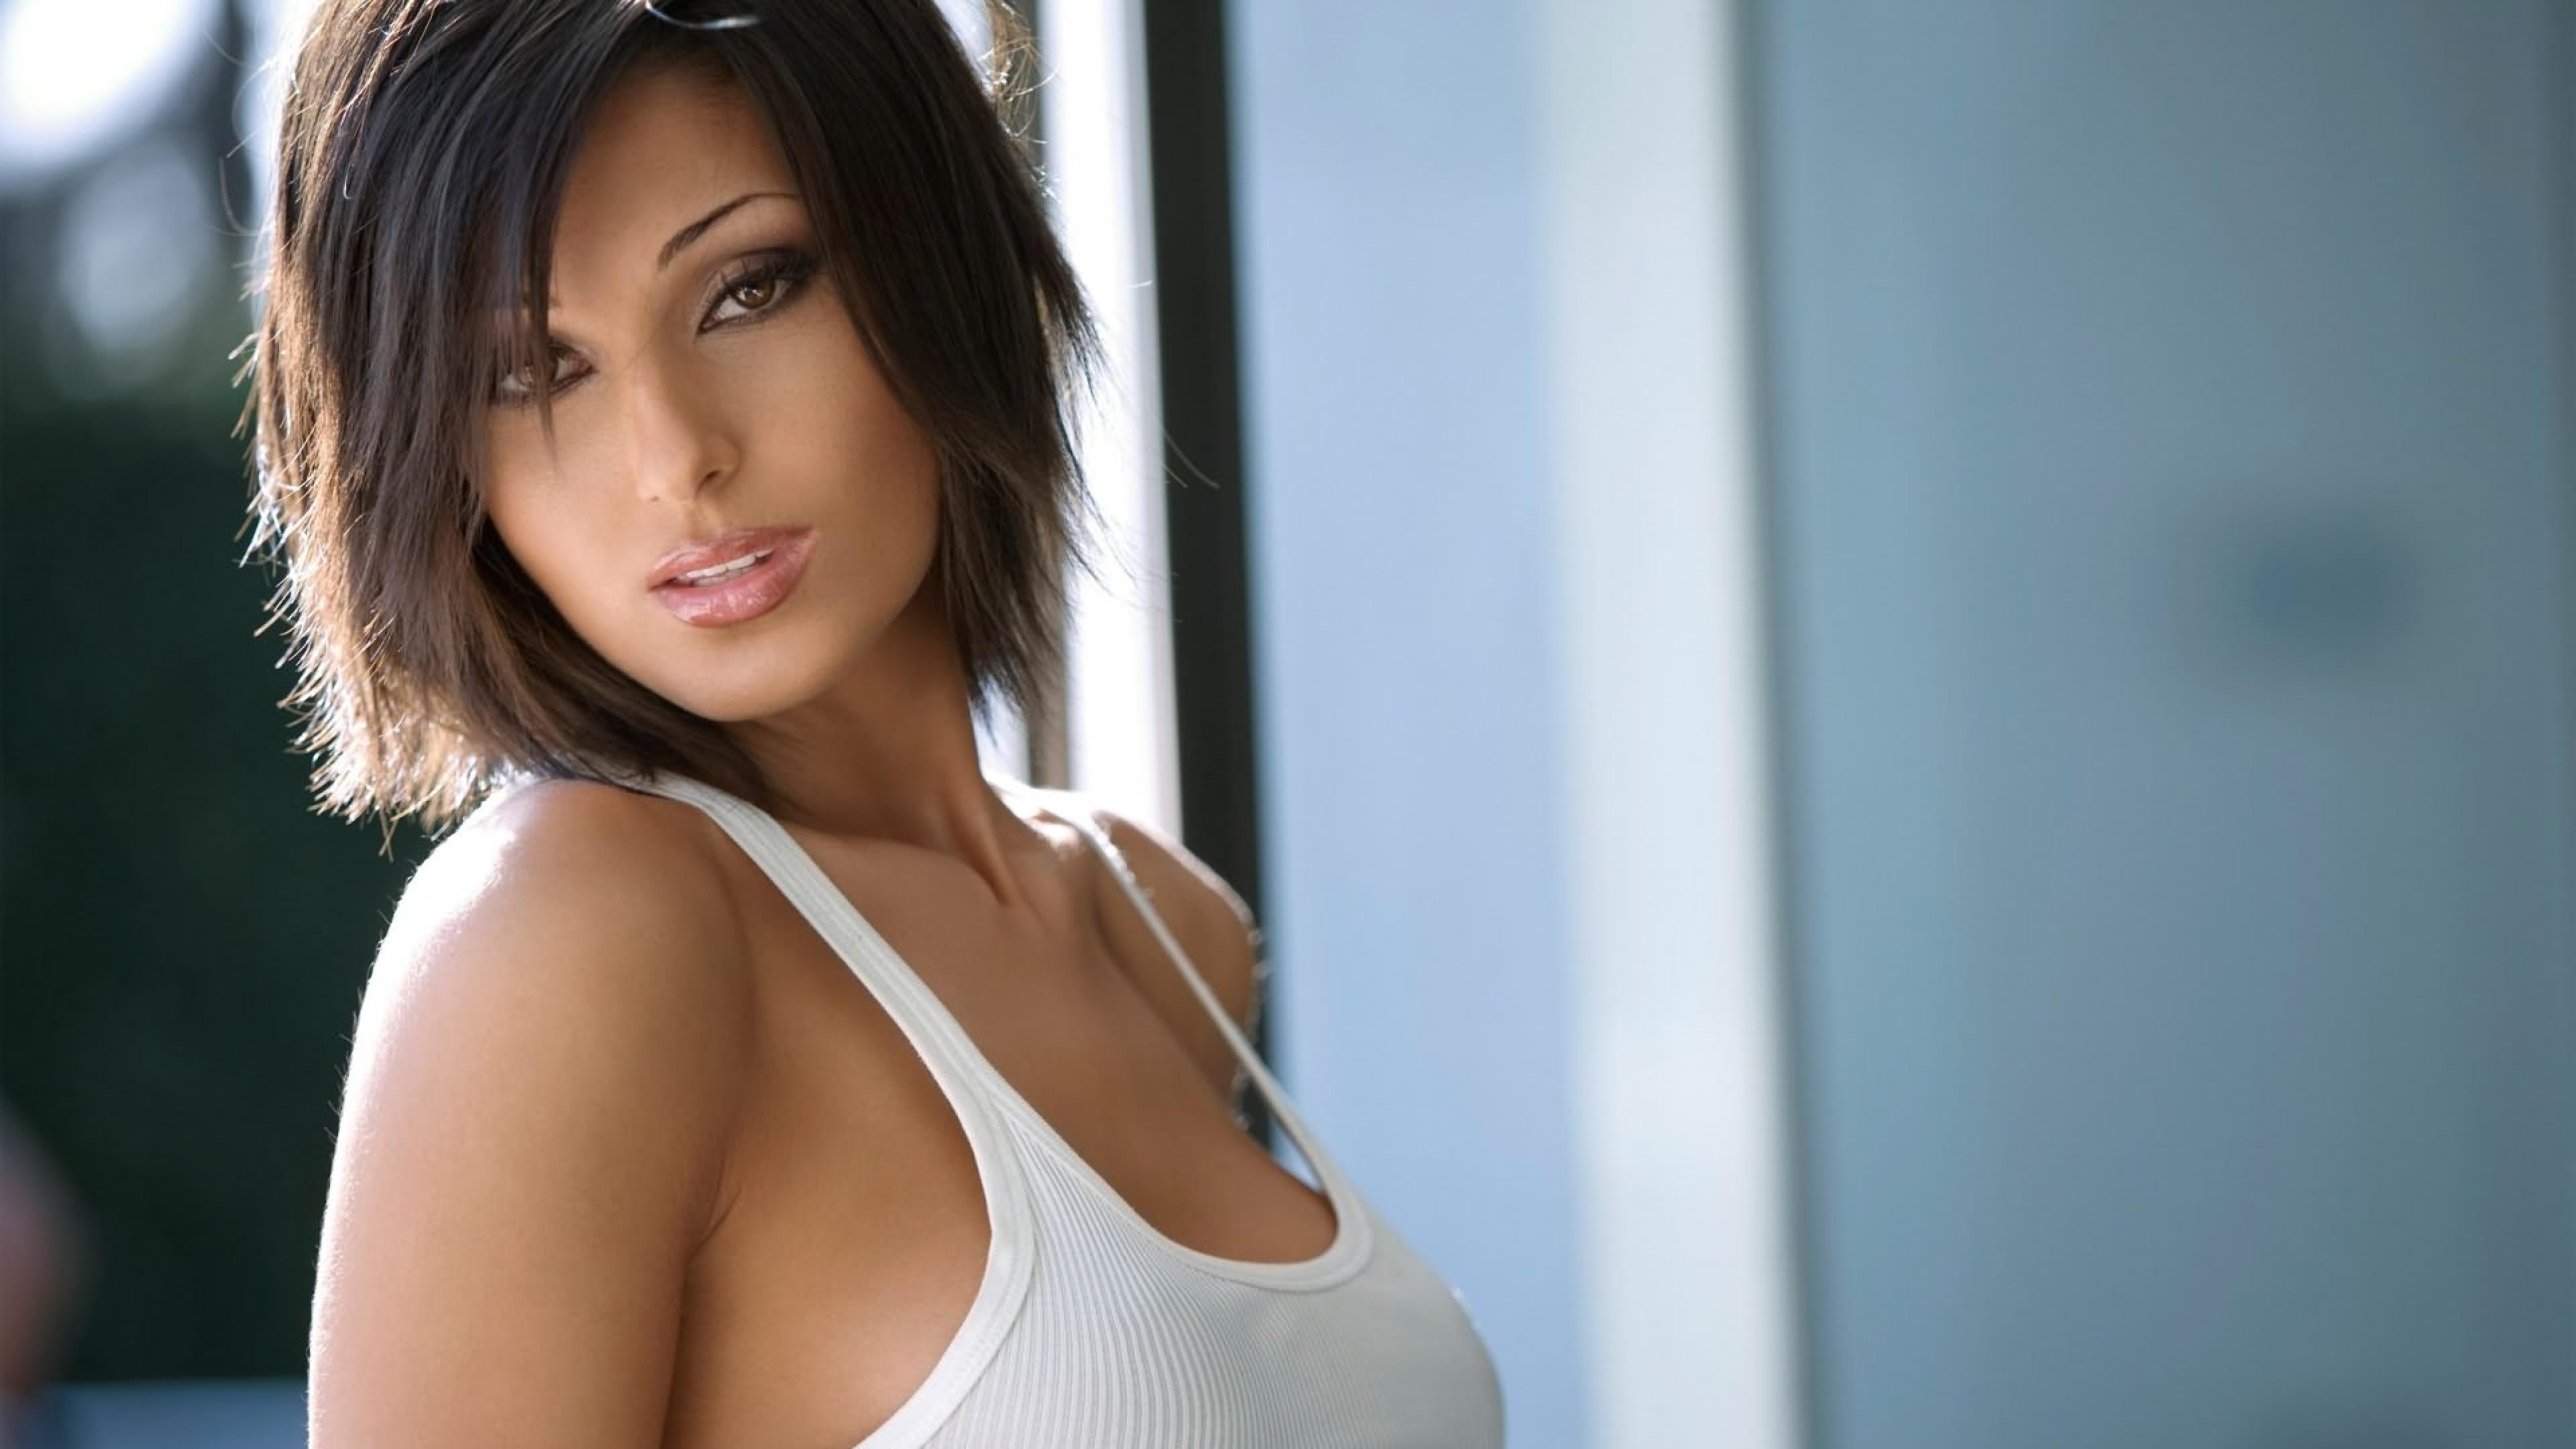 3840x2160 Wallpaper model, brunette, face, girl, beautiful